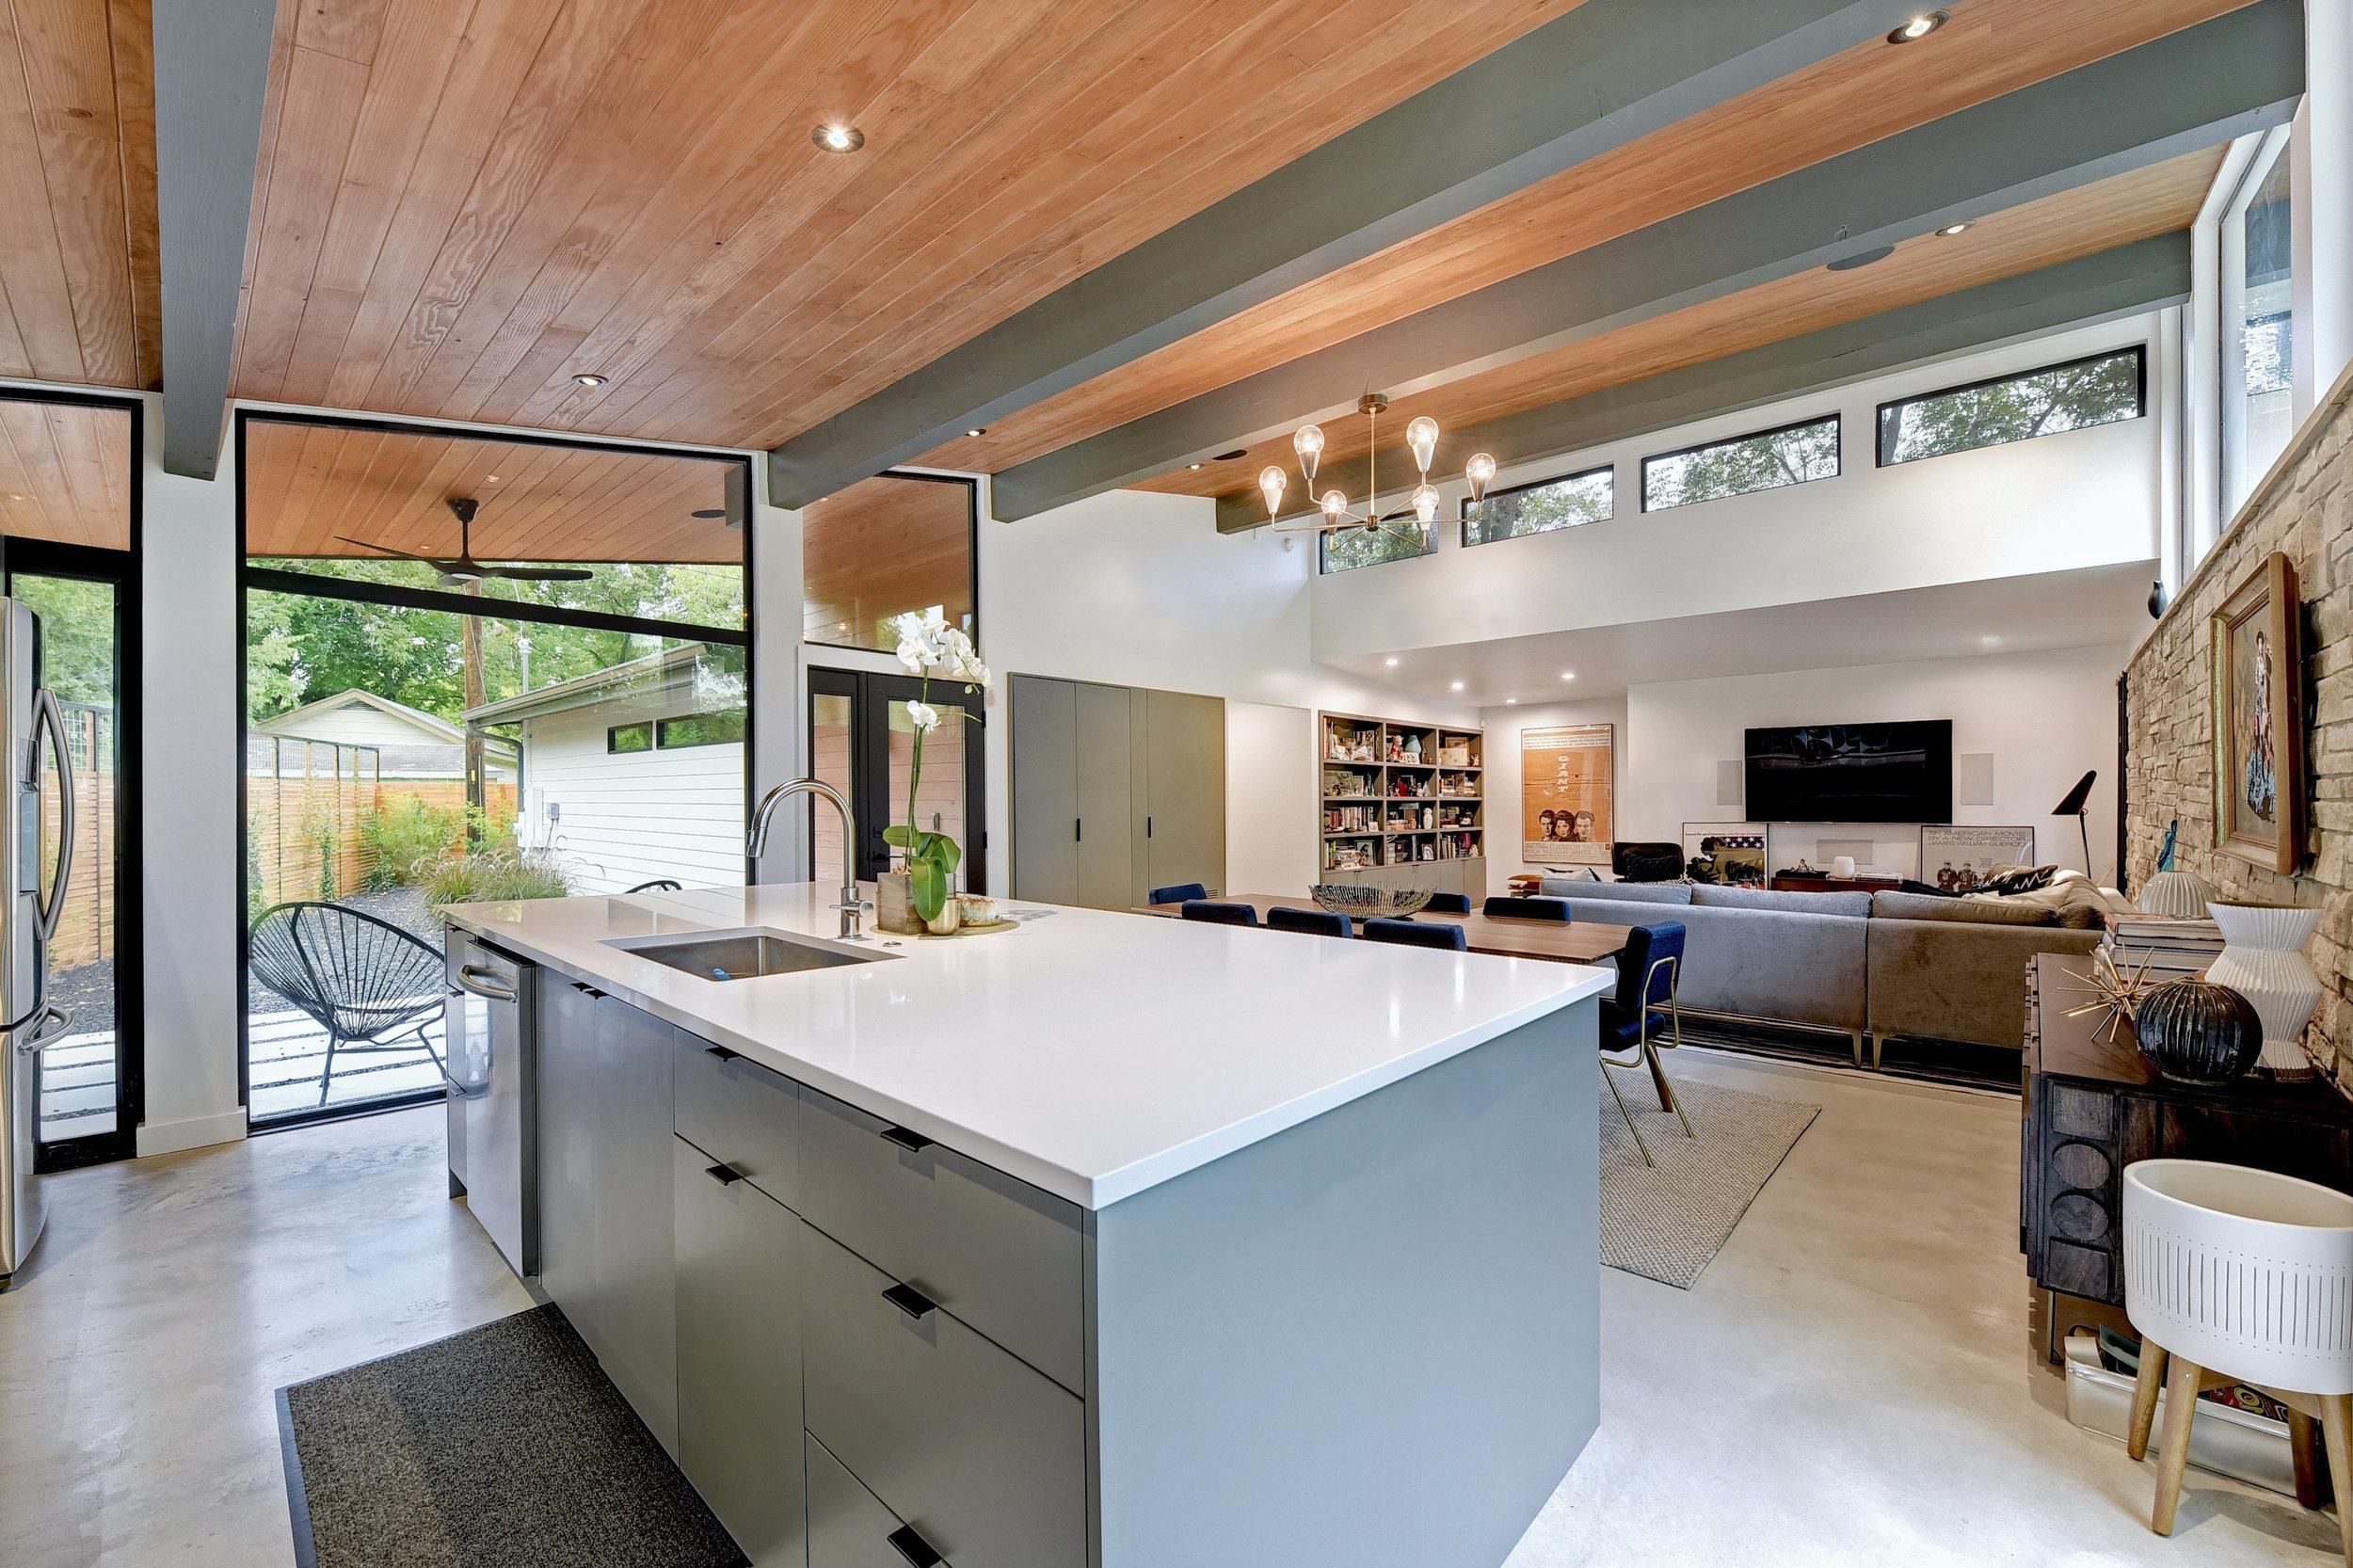 11 Re-Open House by Matt Fajkus Architecture - Photo by Charles Davis Smith.jpg